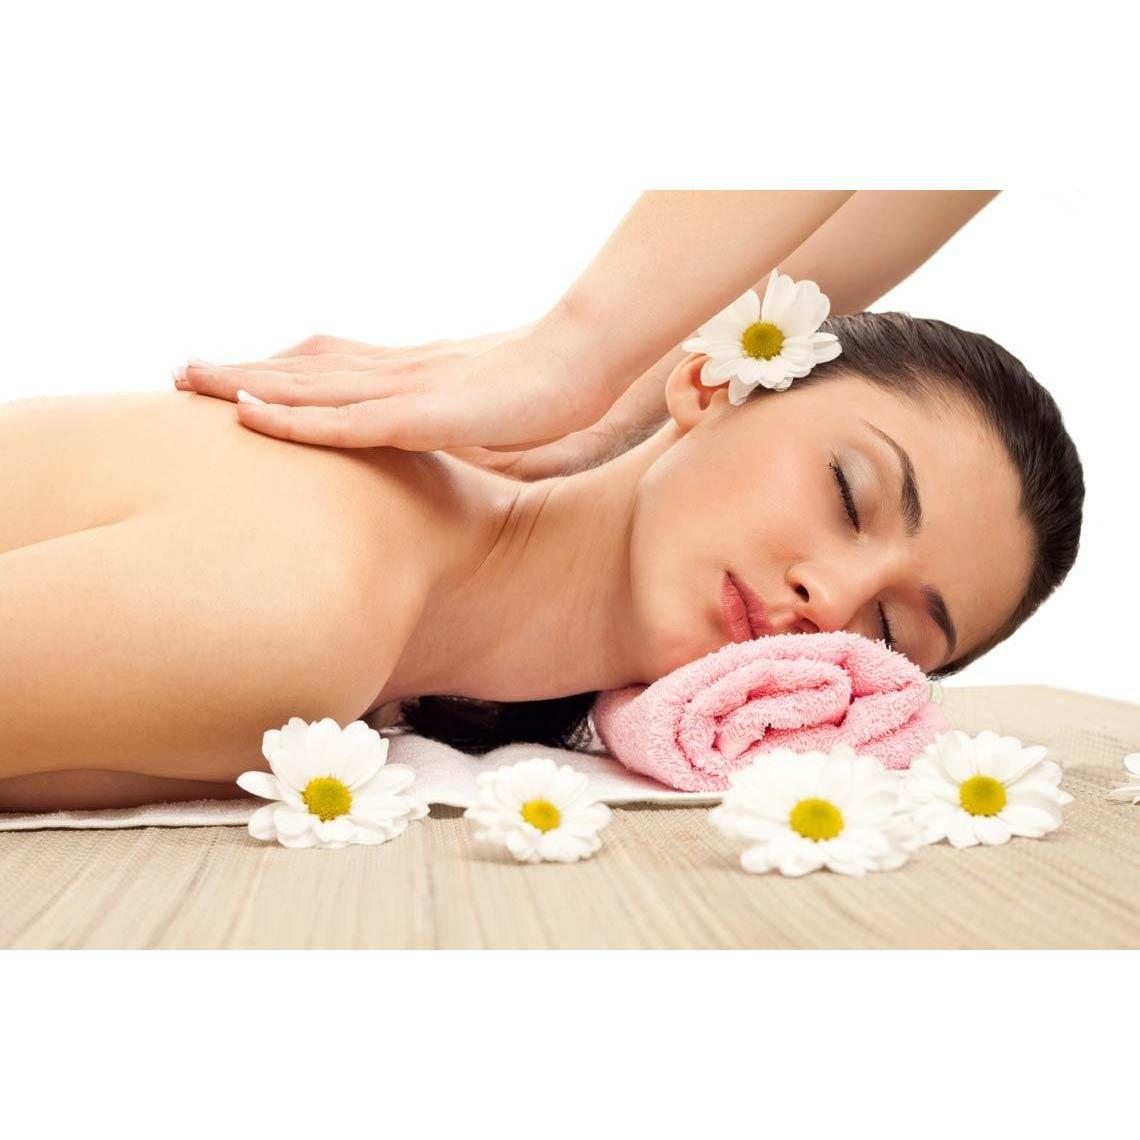 Massage Well Spa